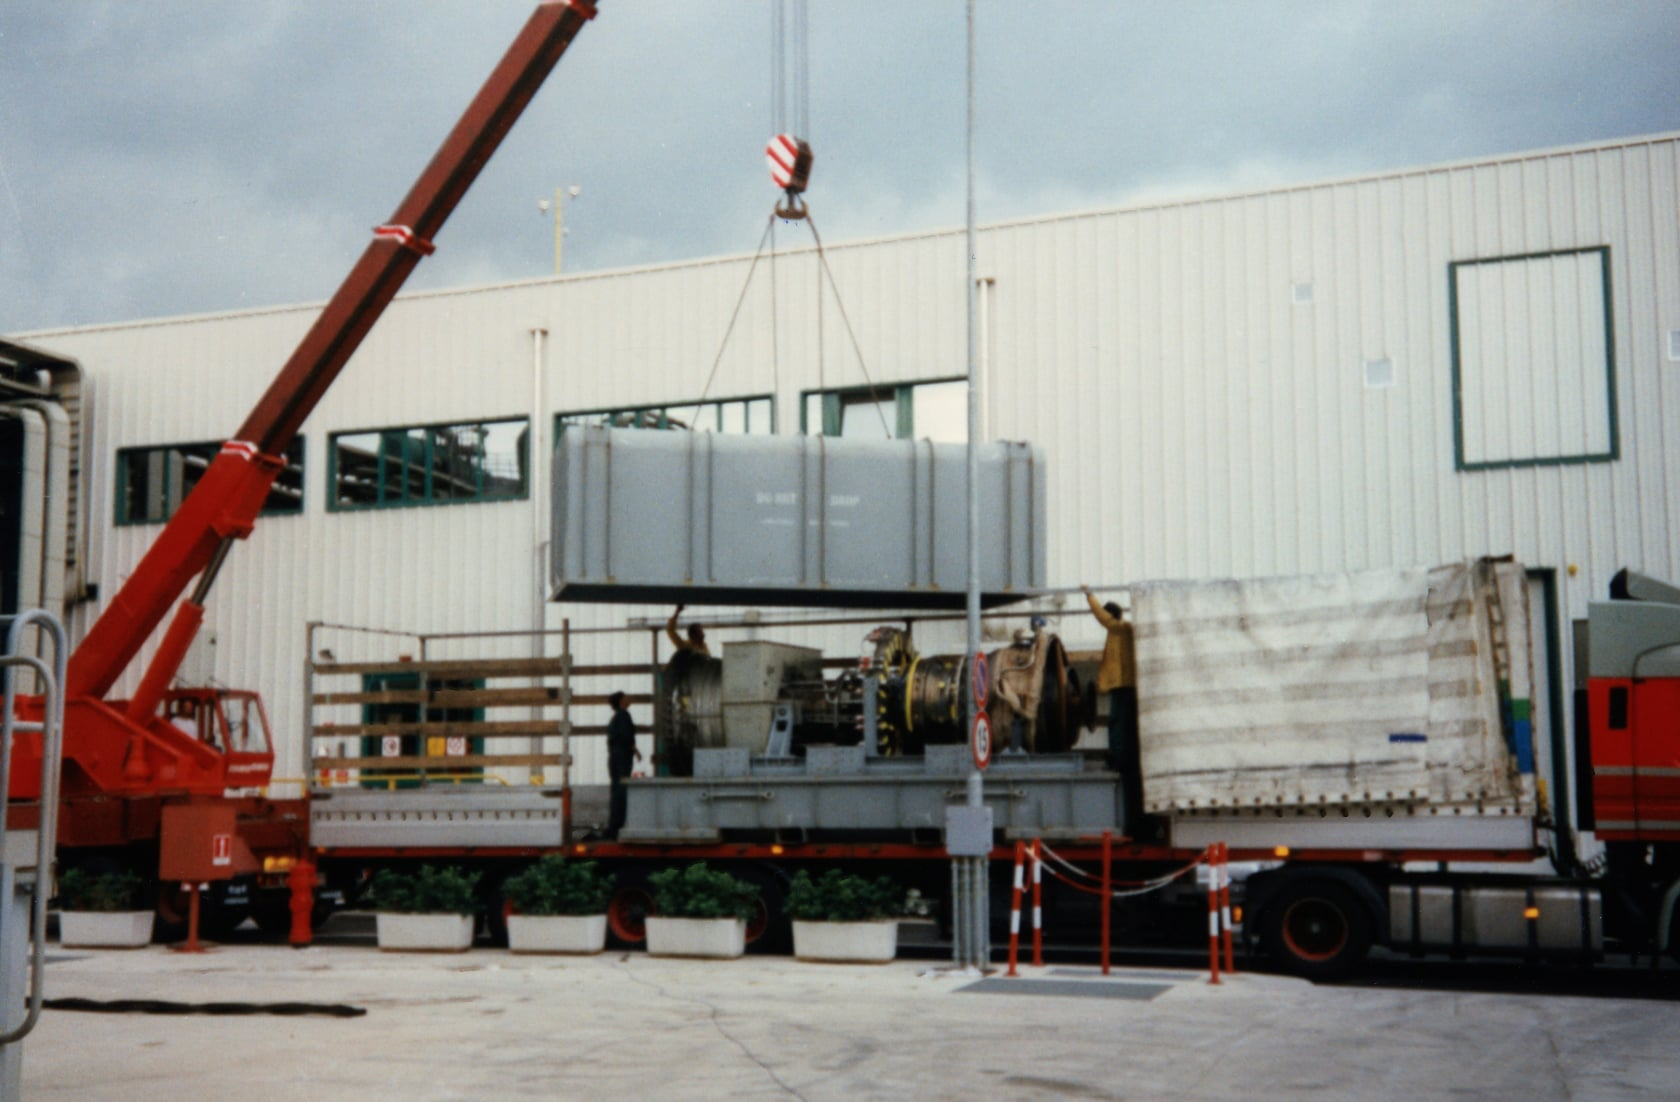 Joop-de-Jong-Vliegtuigmotor-laden-Fa-Sontel-Porcari-19-6-1997-17-ton-van-8-tot-17-uur-(2)